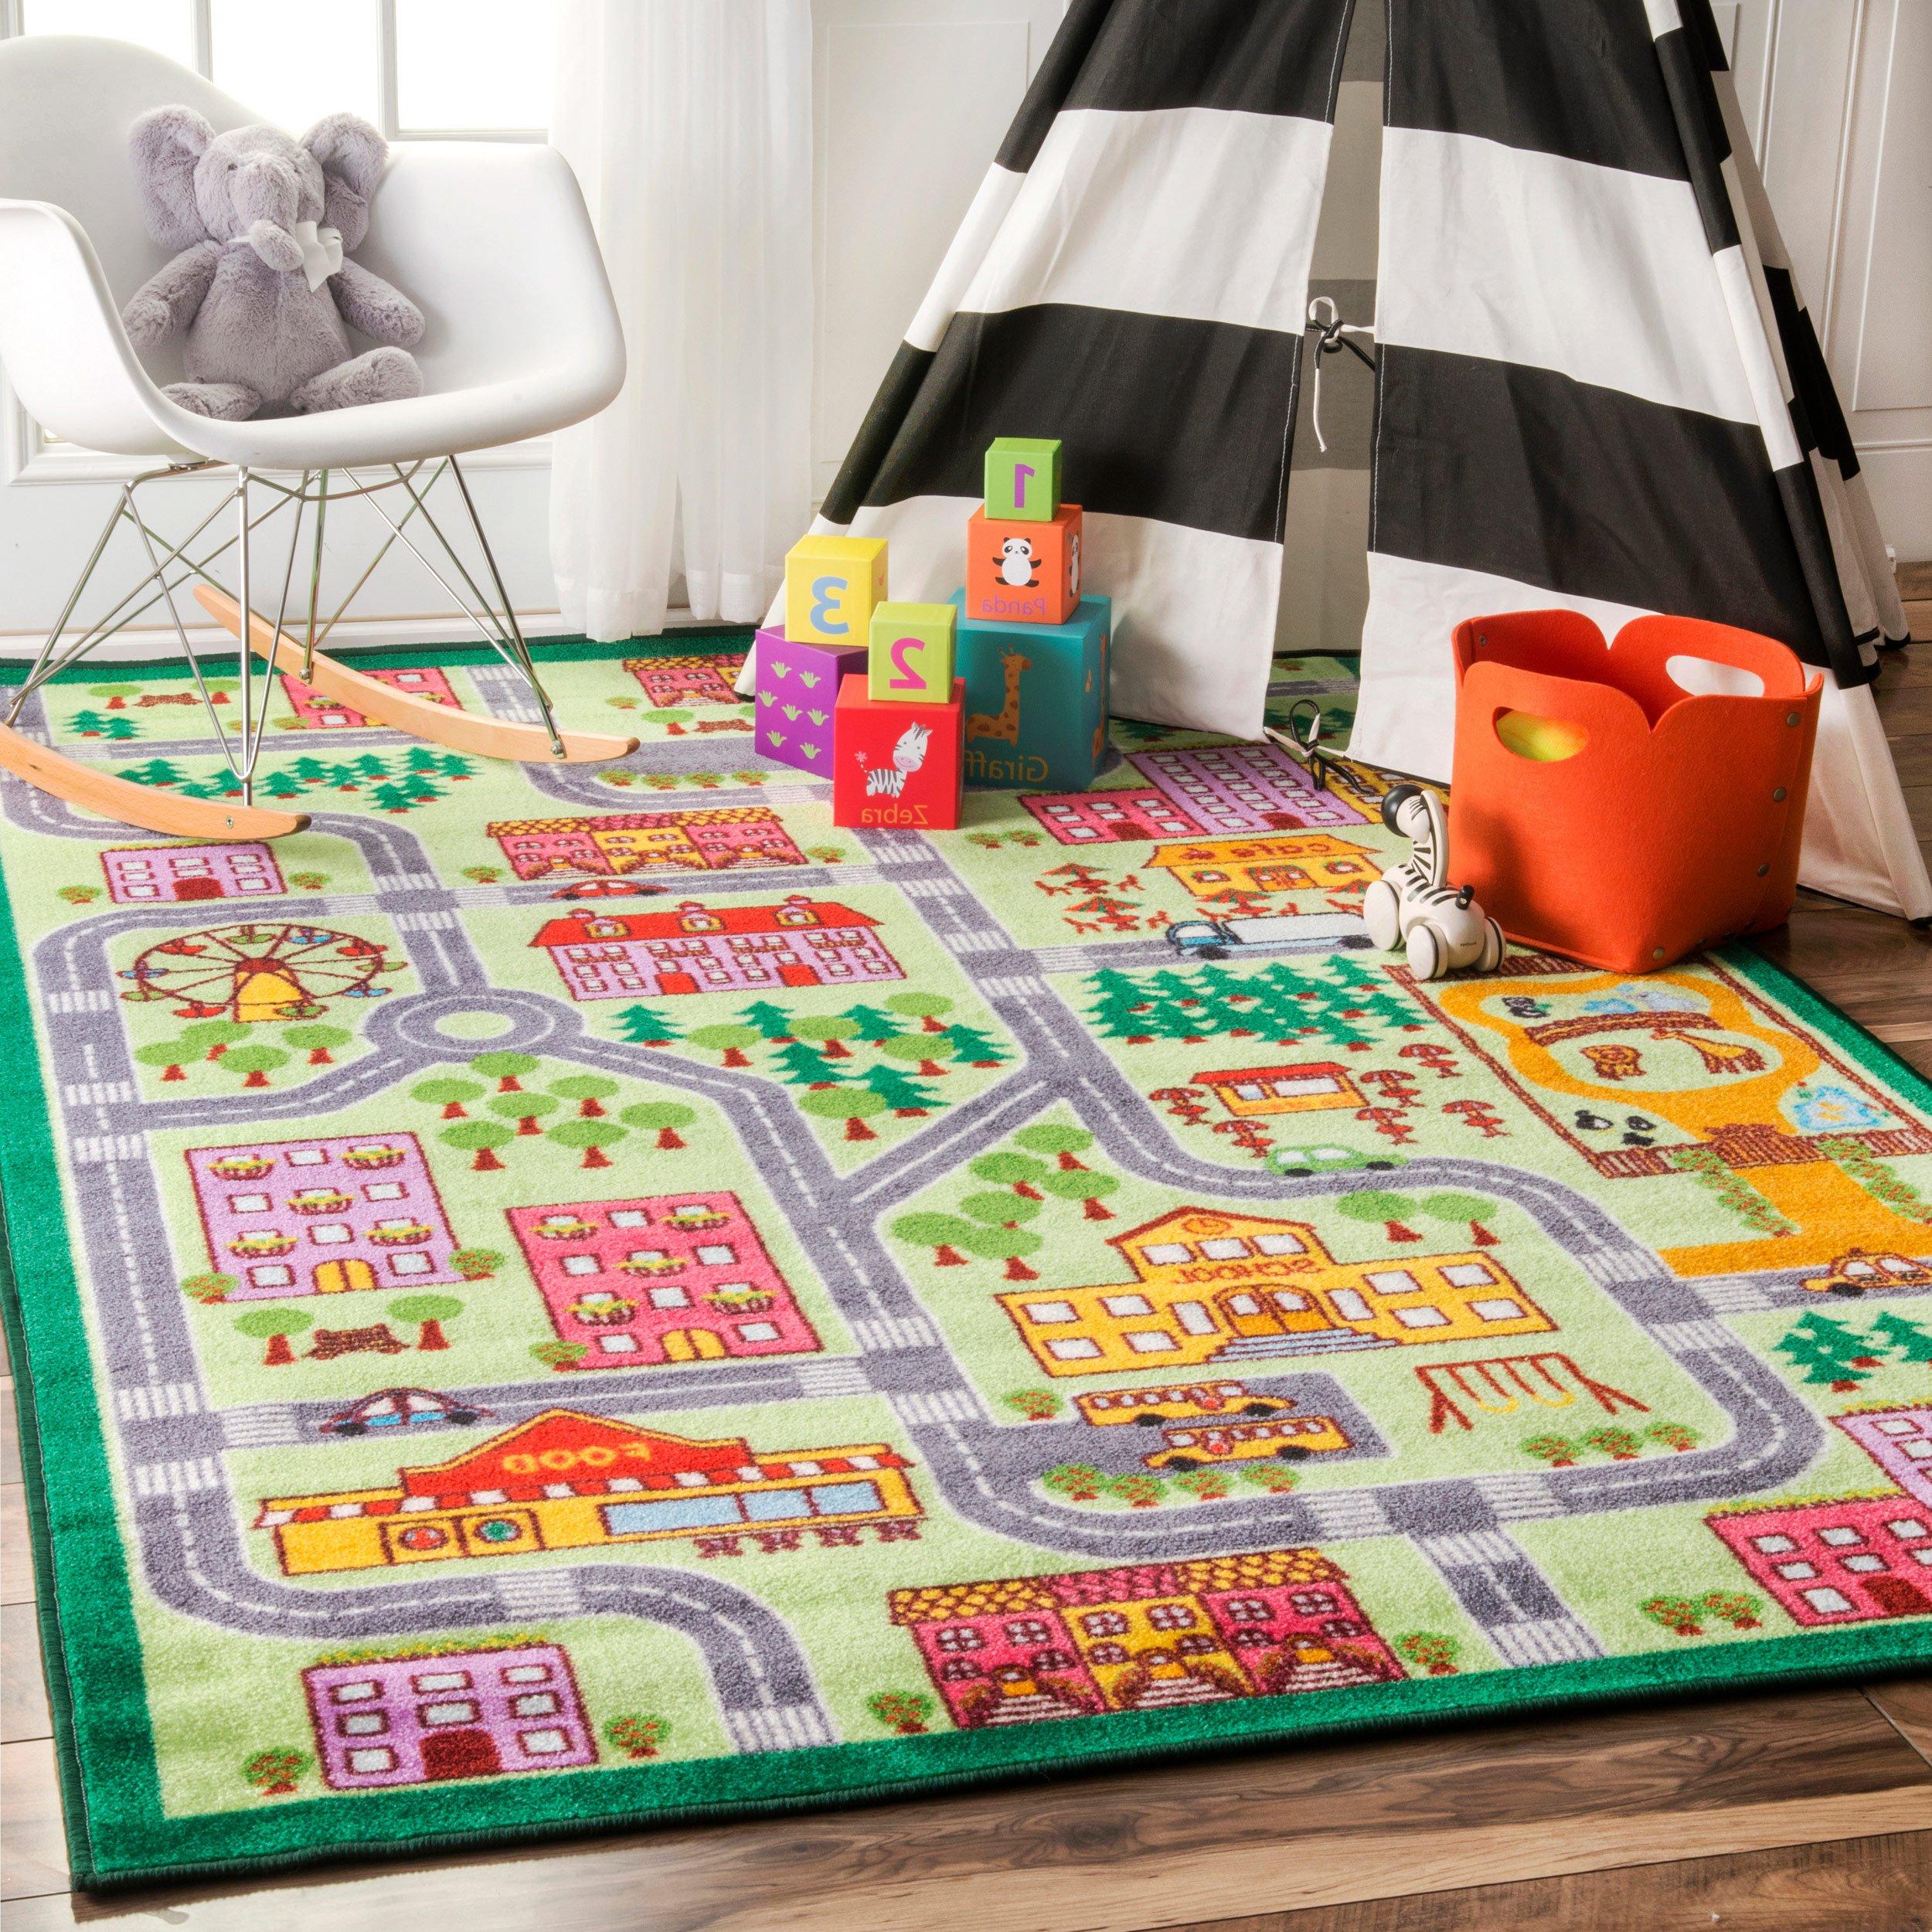 Nursery City Neighborhood Multi Kids Area Rugs, 5 Feet by 7 Feet 5 Inches (5' x 7' 5'')